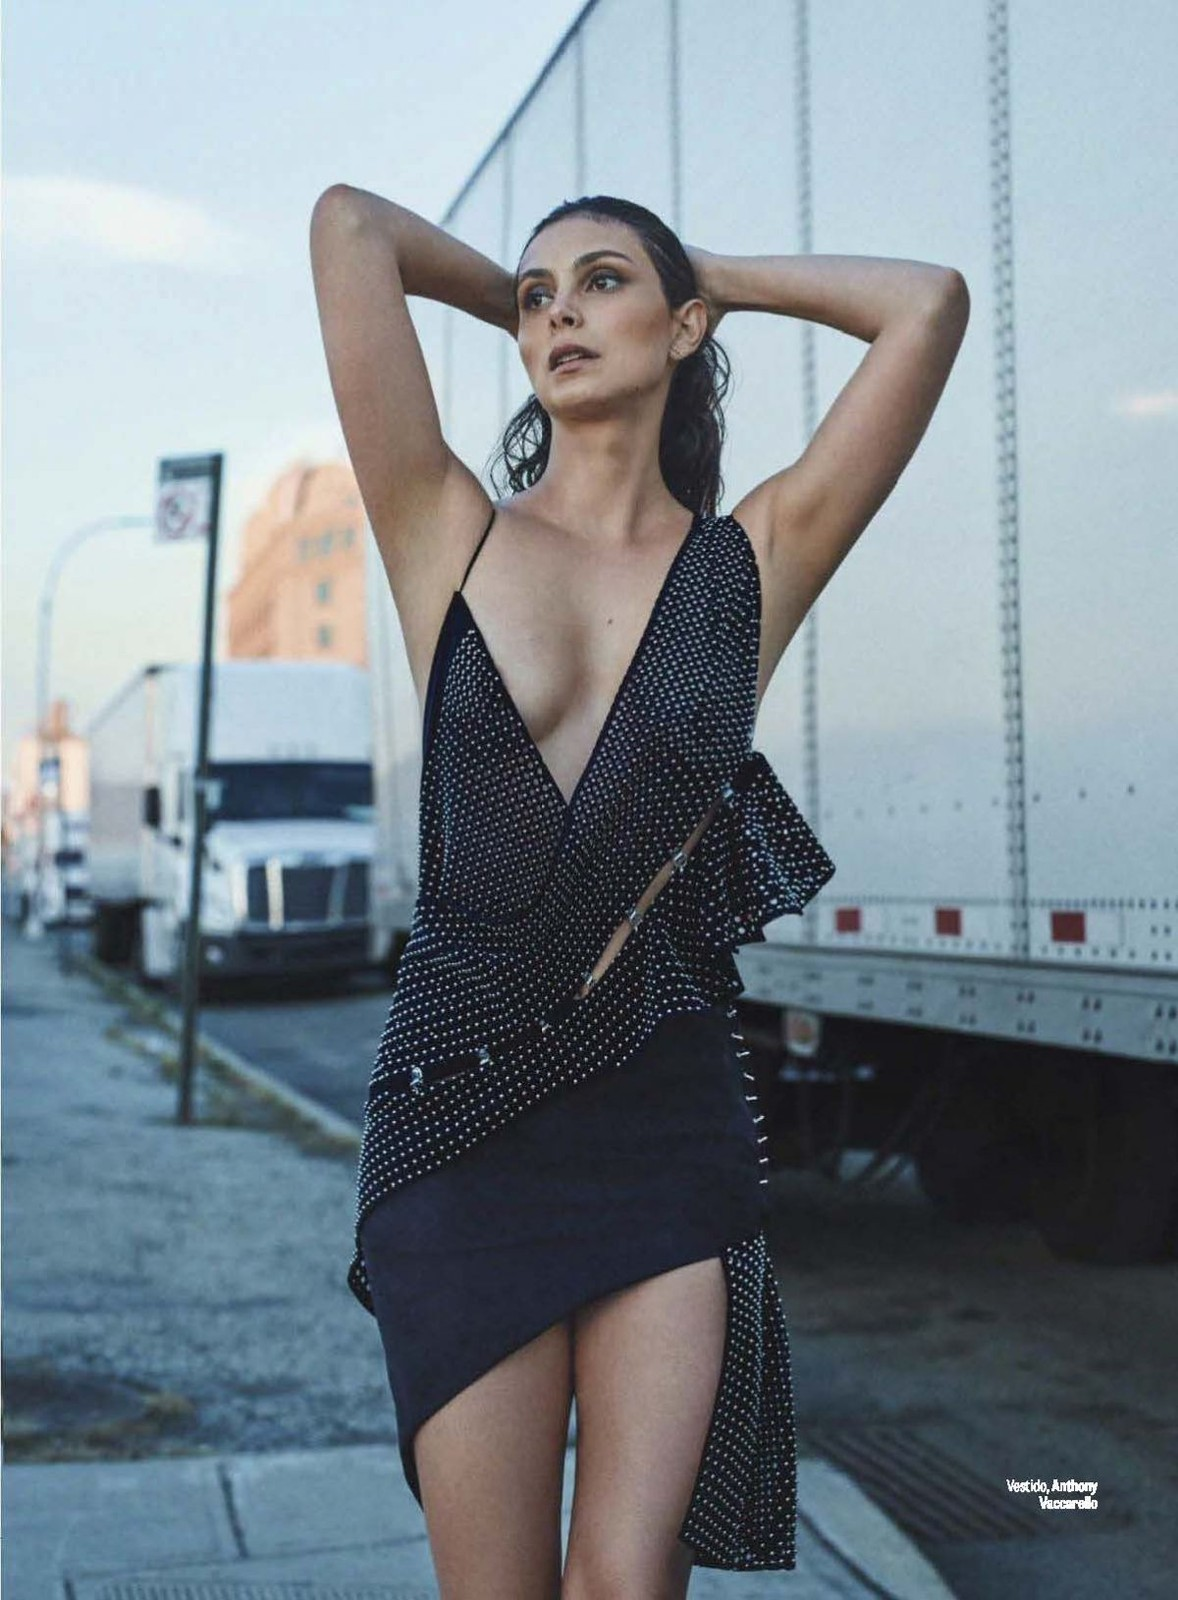 Fappening Hot Leah Francis naked photo 2017